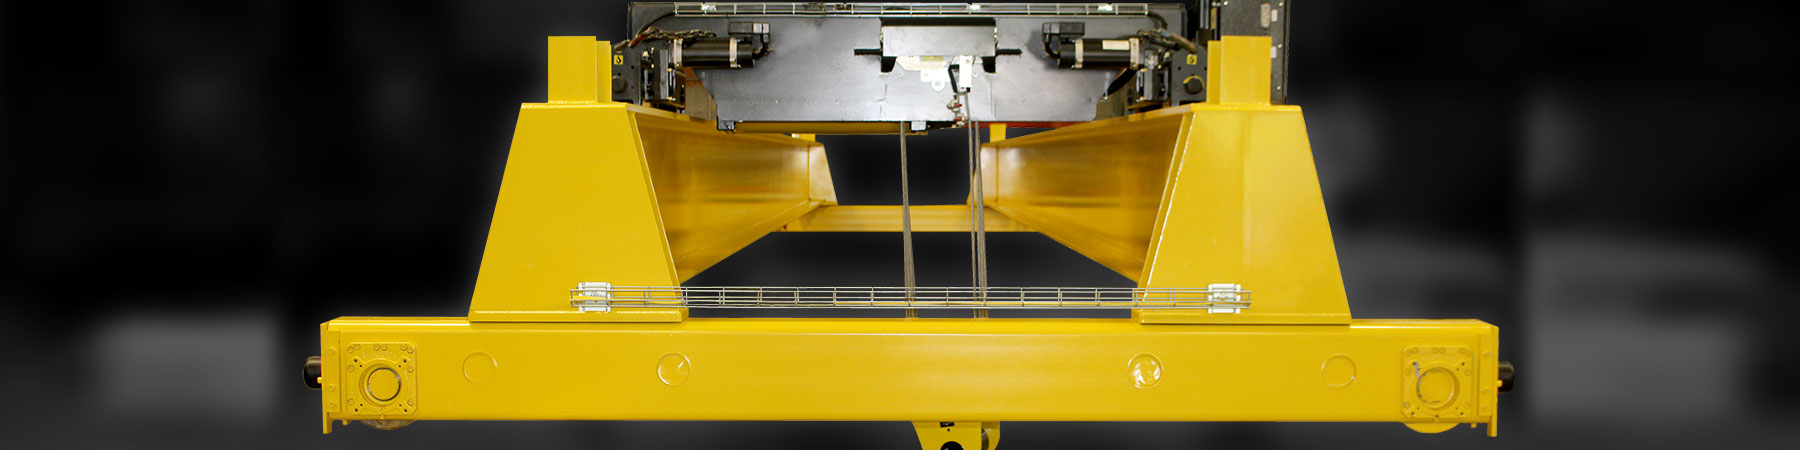 Crane End Trucks And Crane Kits By Yale Lift Tech